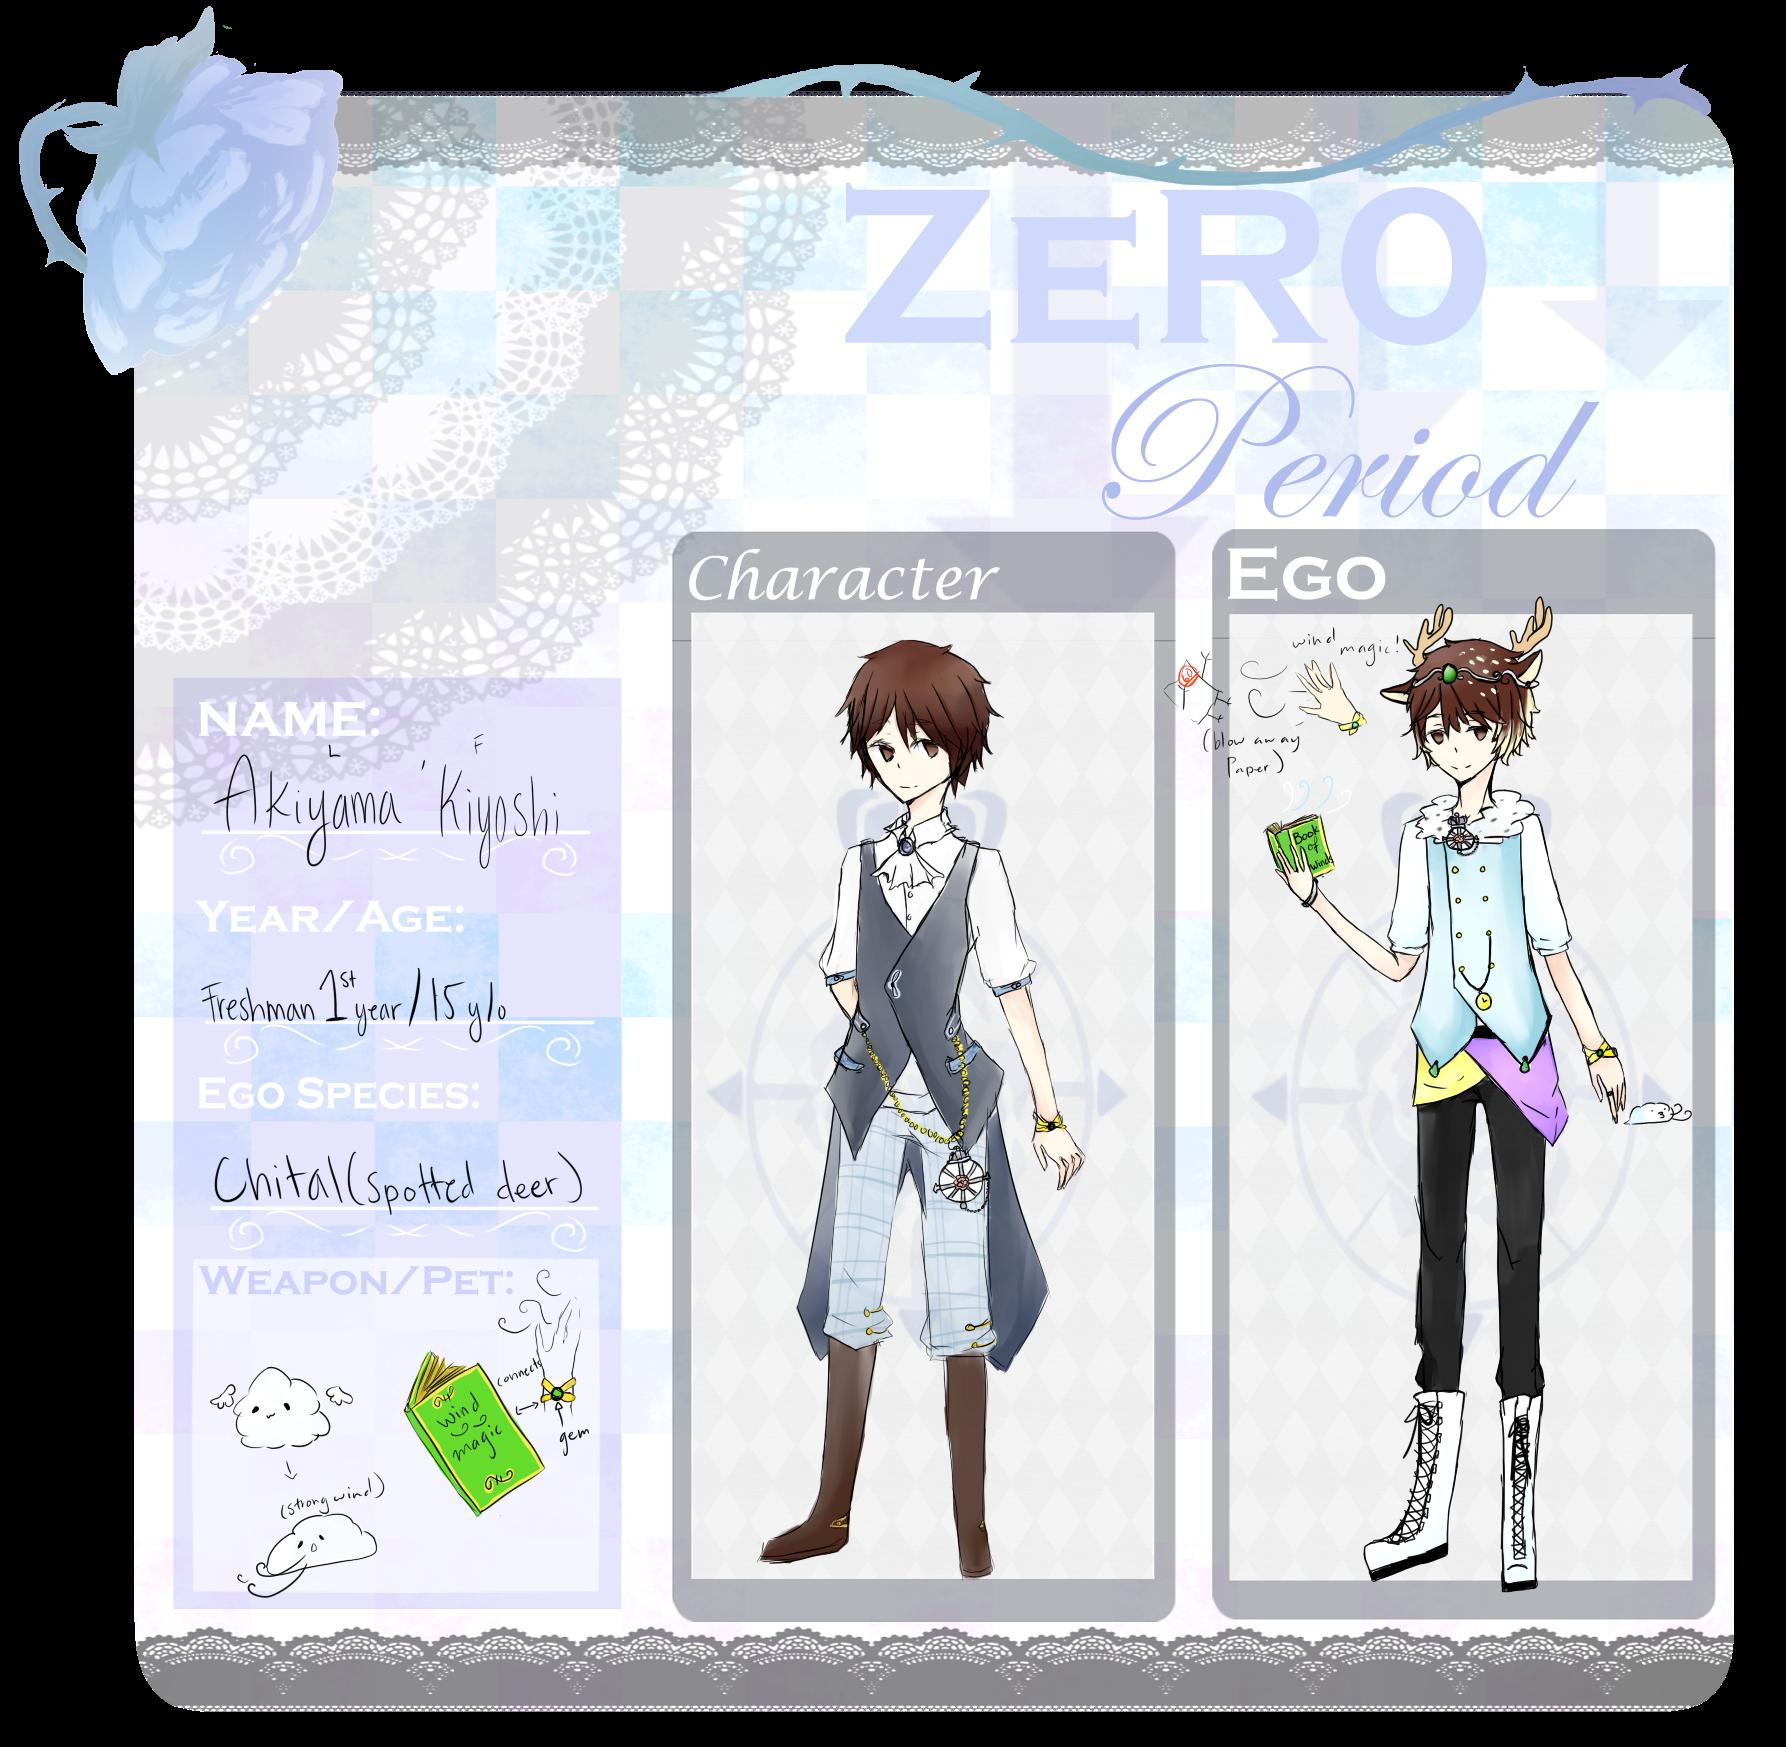 Akiyama Kiyoshi for Zero-period by lilsummer